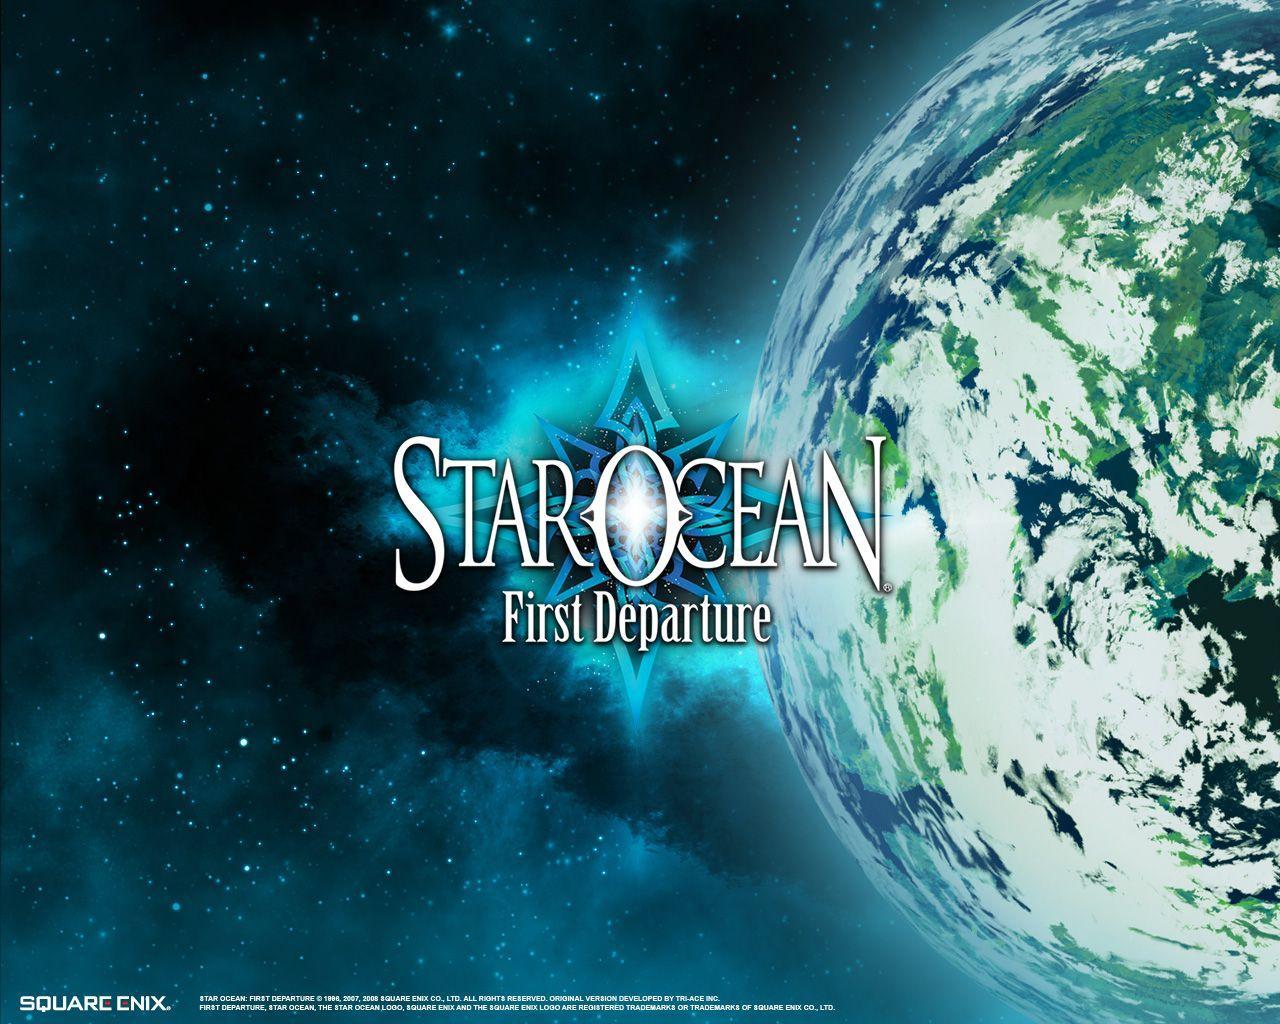 Star Ocean Wallpapers Top Free Star Ocean Backgrounds